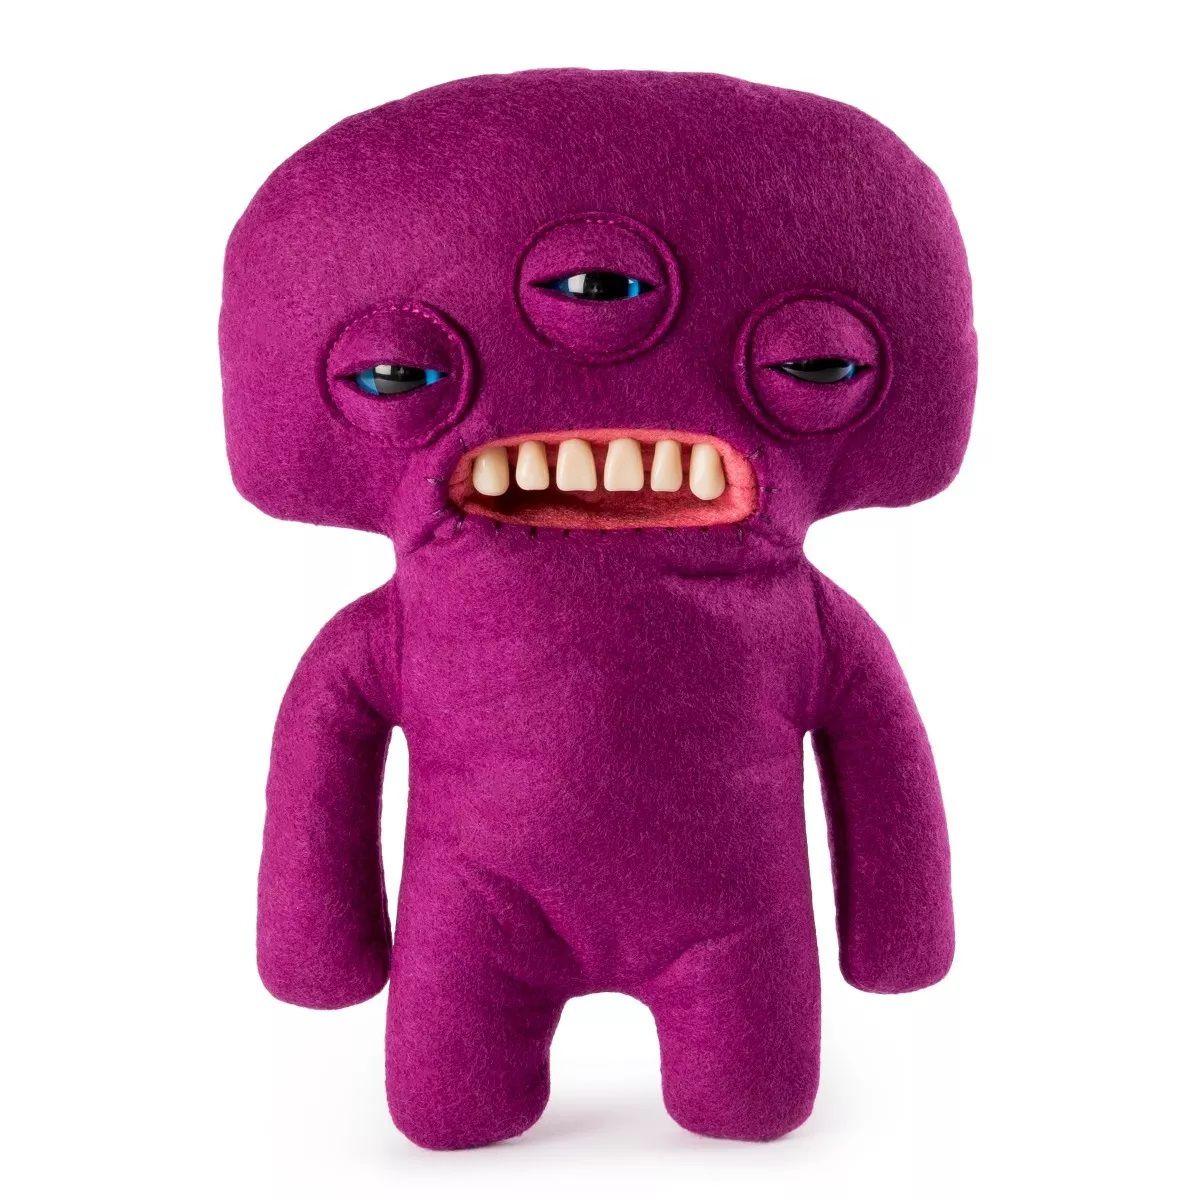 Pelúcia Monstruosa Roxo Média Fuggler Funny Ugly Monster 1915 Sunny